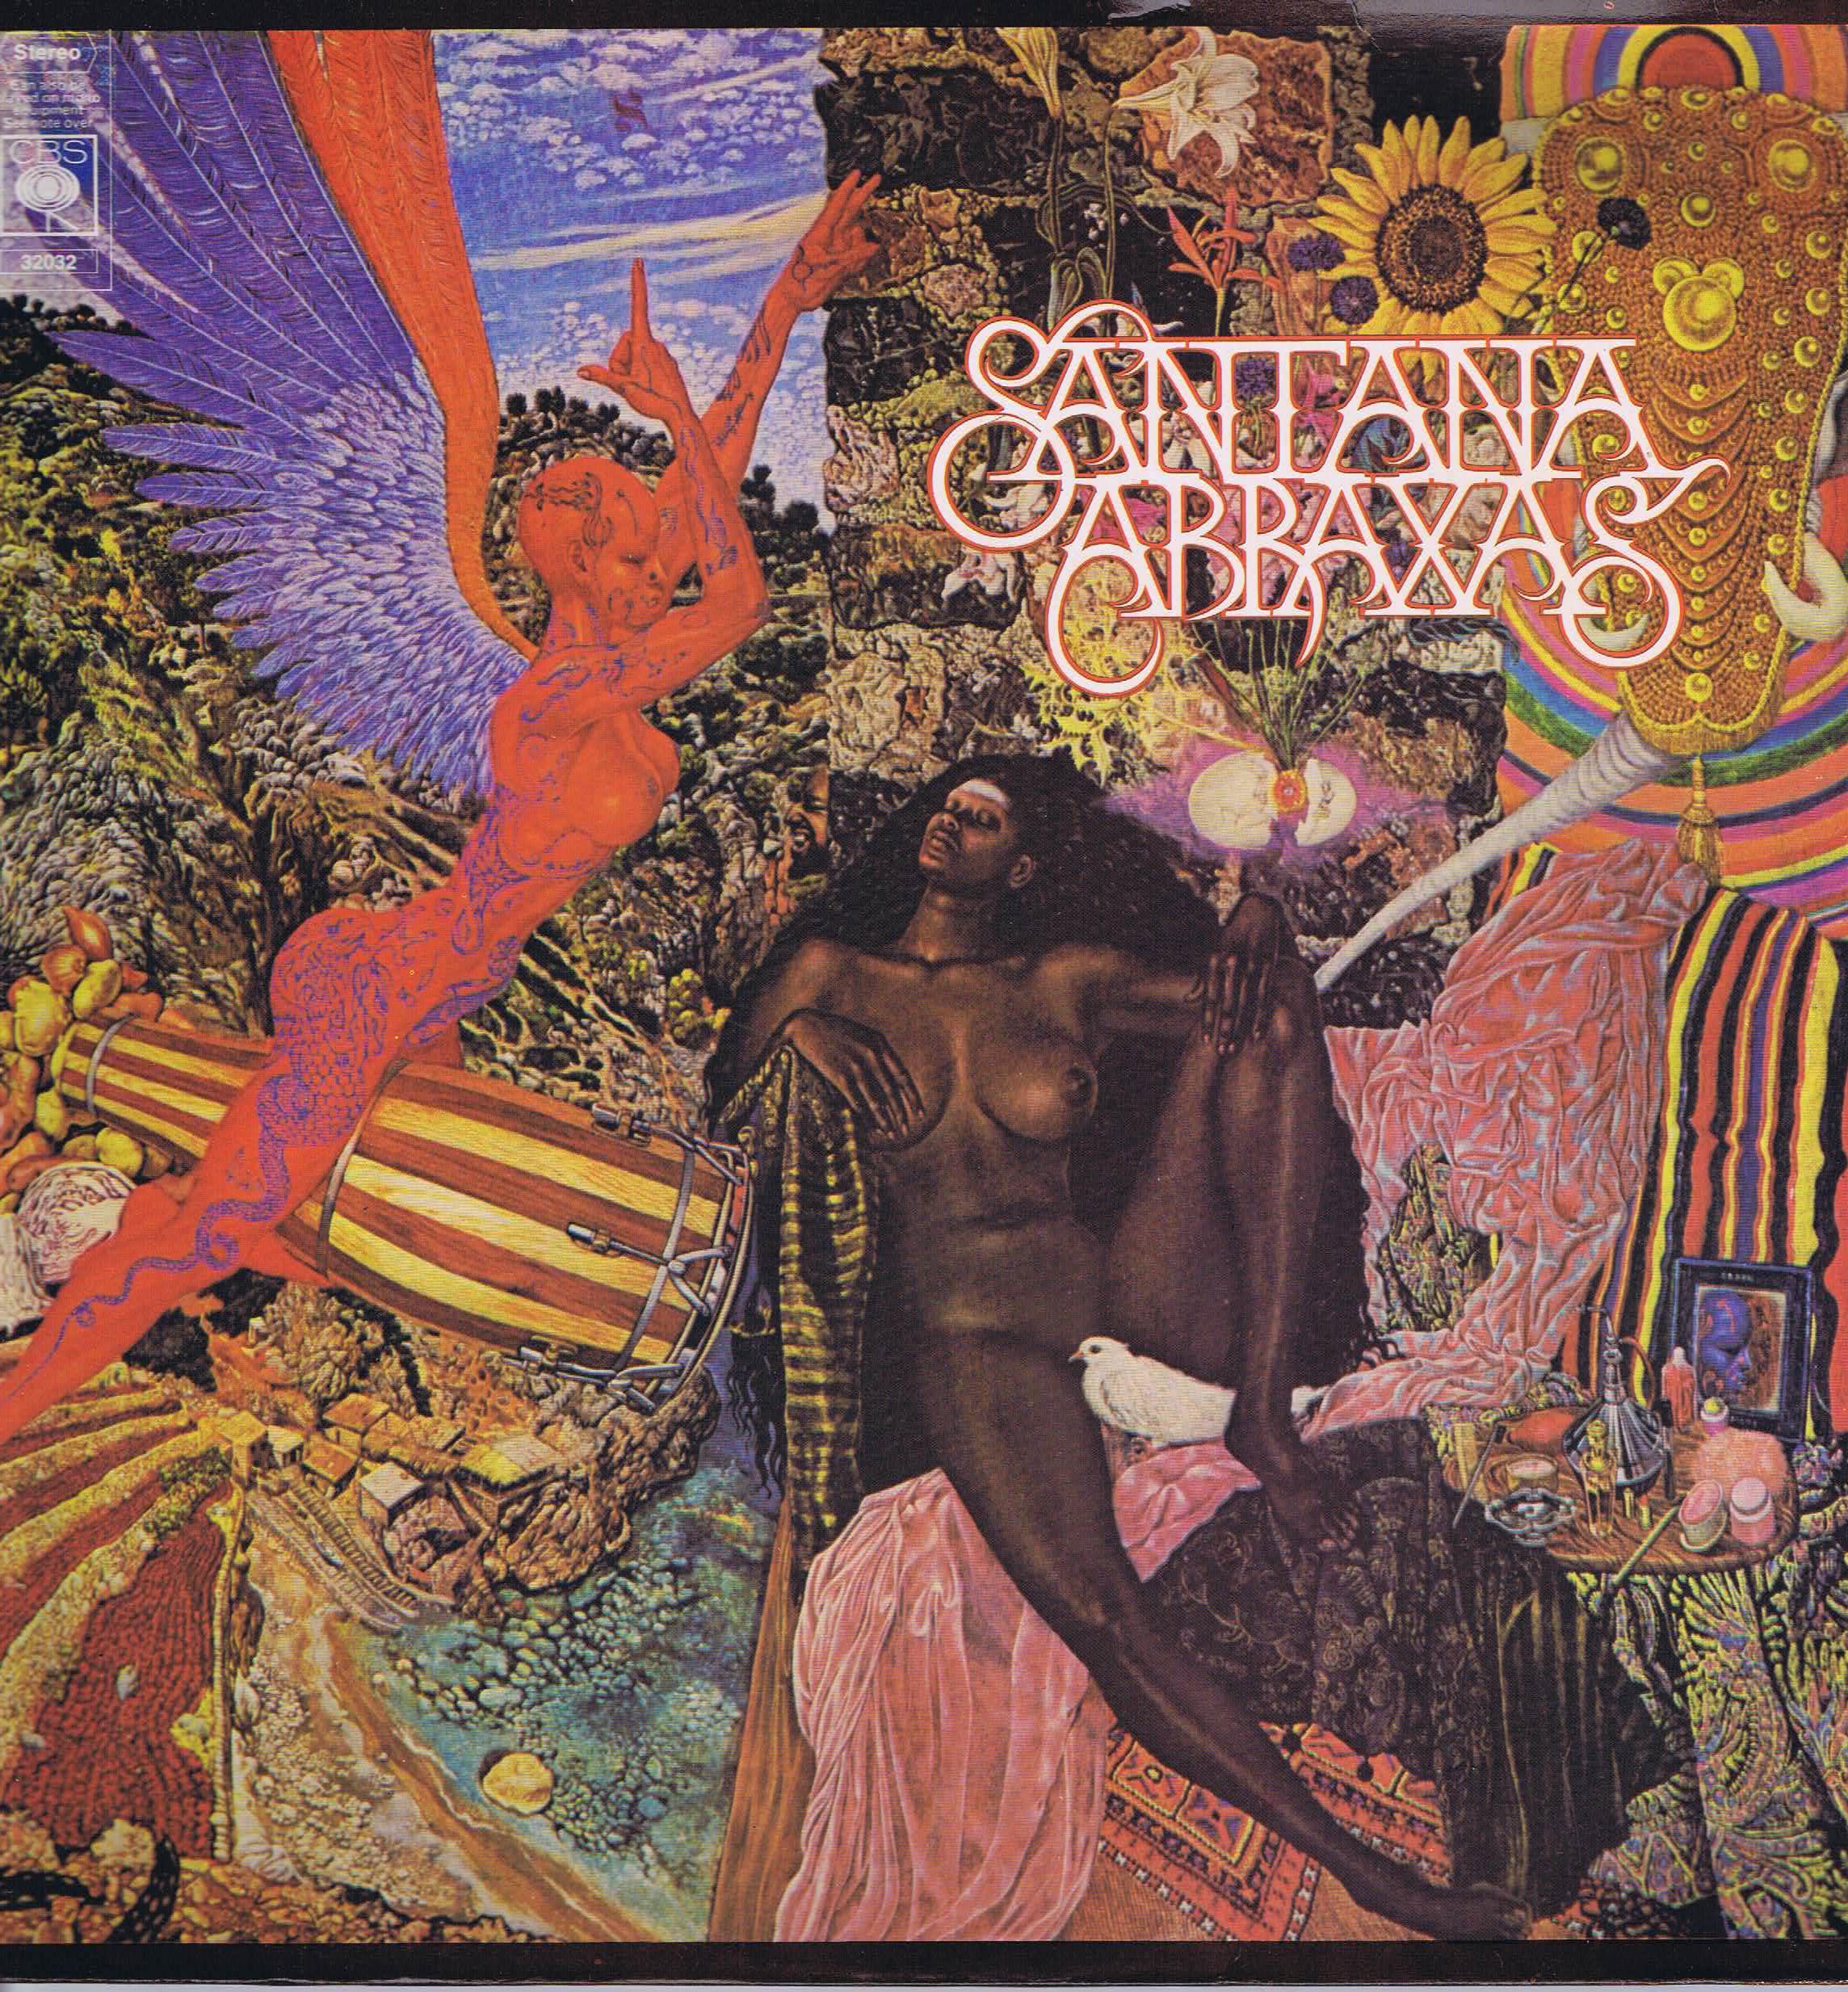 Santana Abraxas Cbs 32032 Lp Vinyl Record Wax